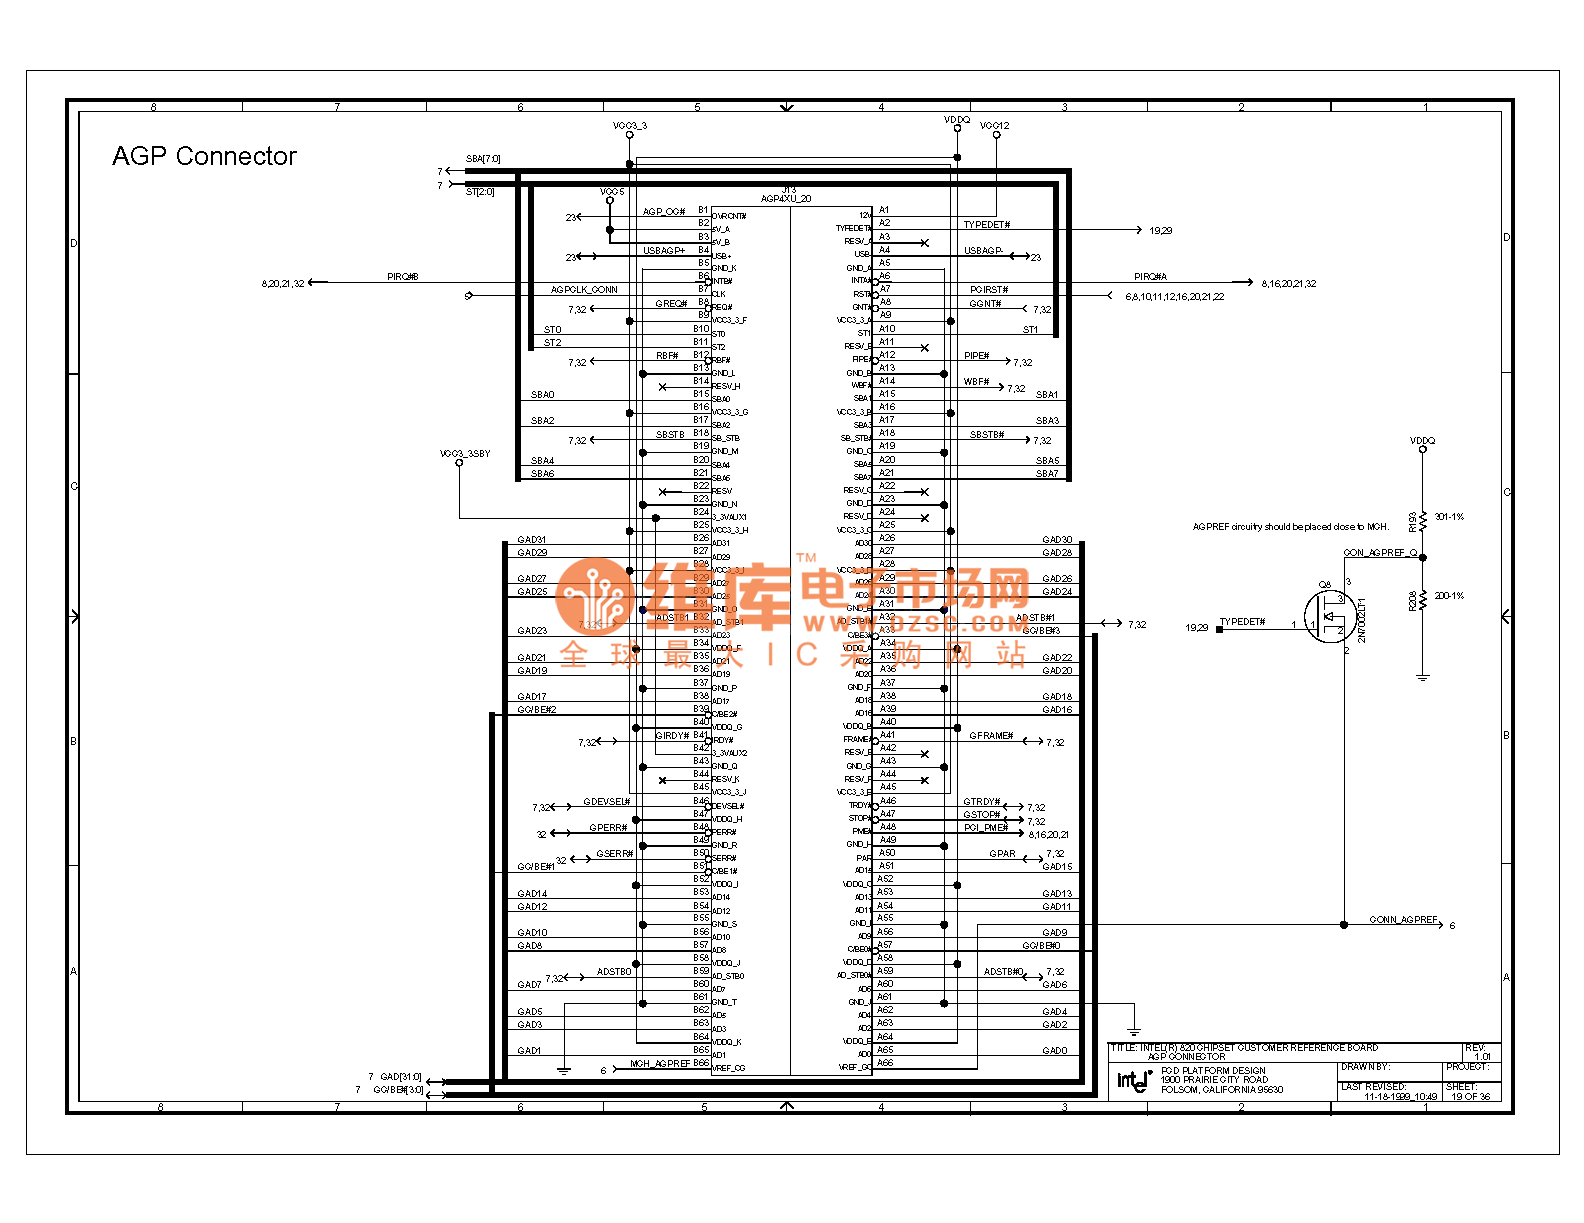 820e computer motherboard circuit diagram 19 - computer-related circuit